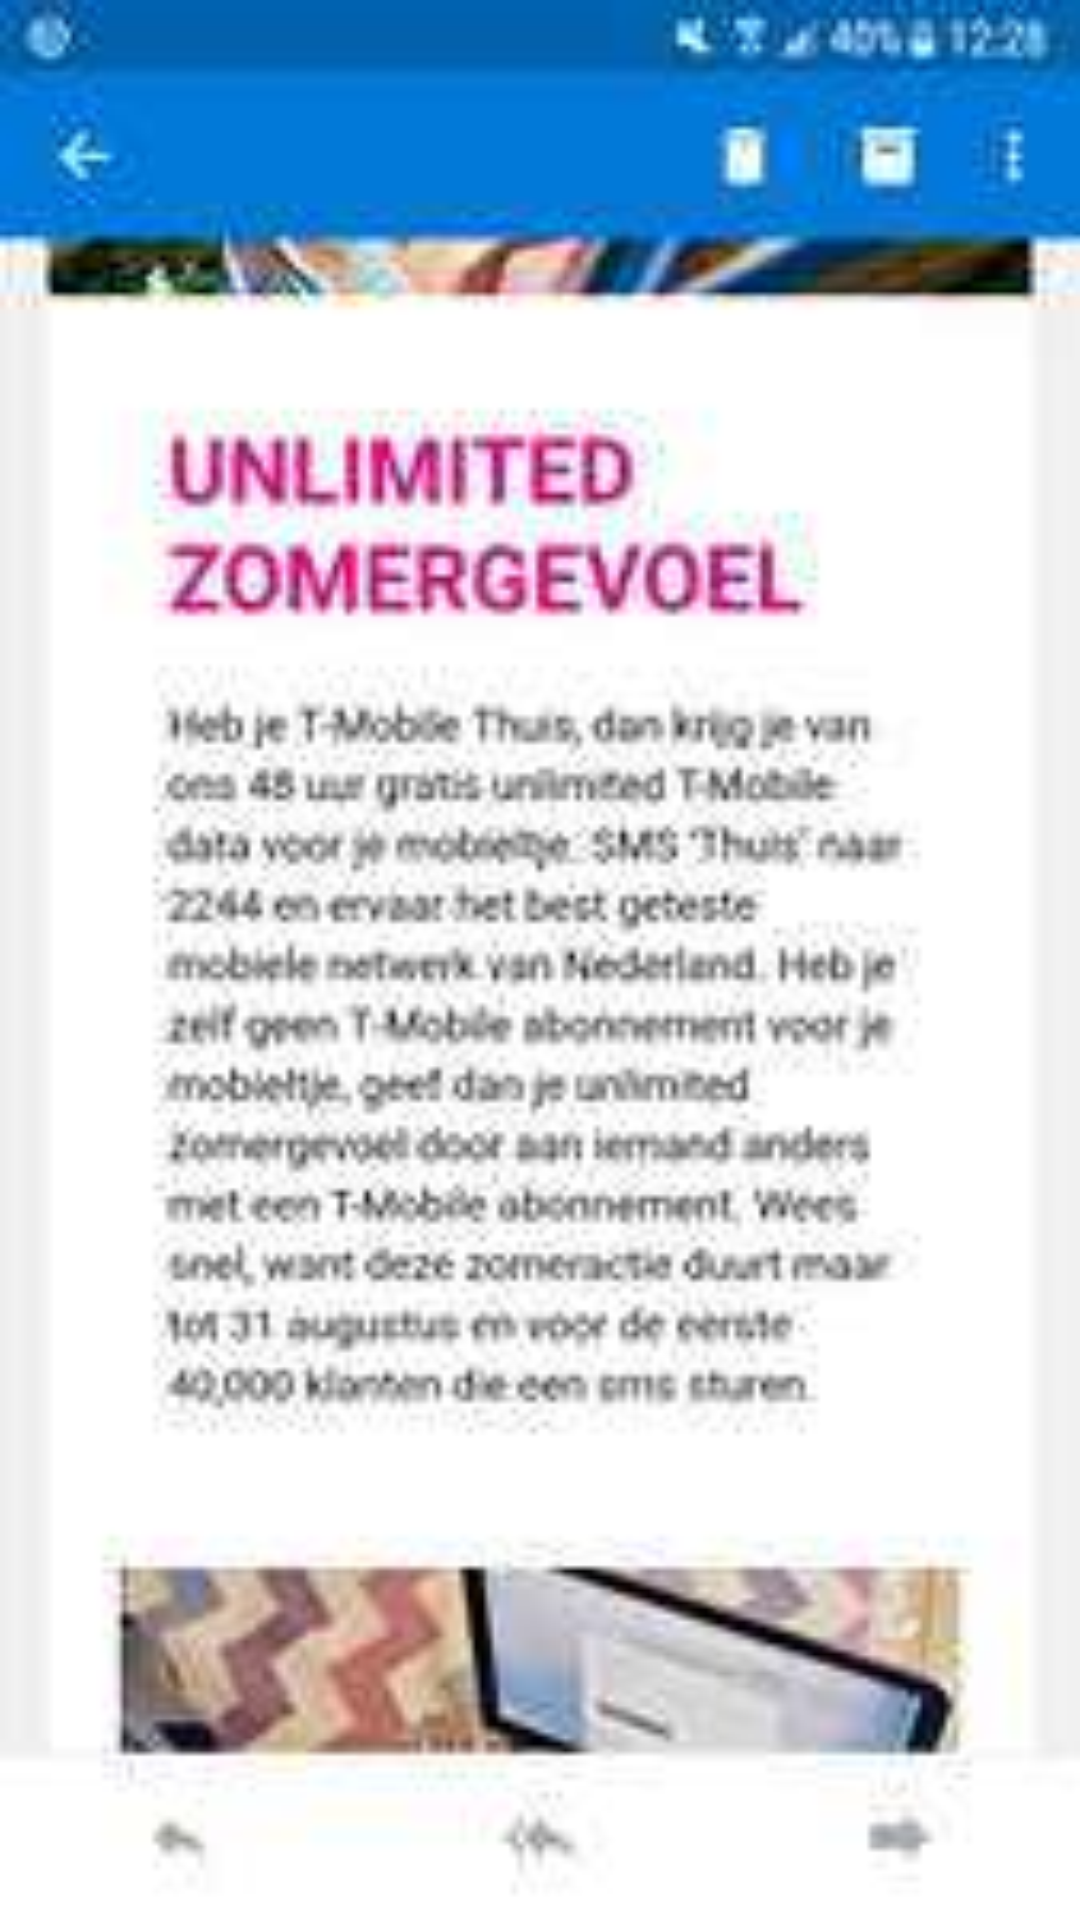 48 uur gratis internet met T-mobile Thuis